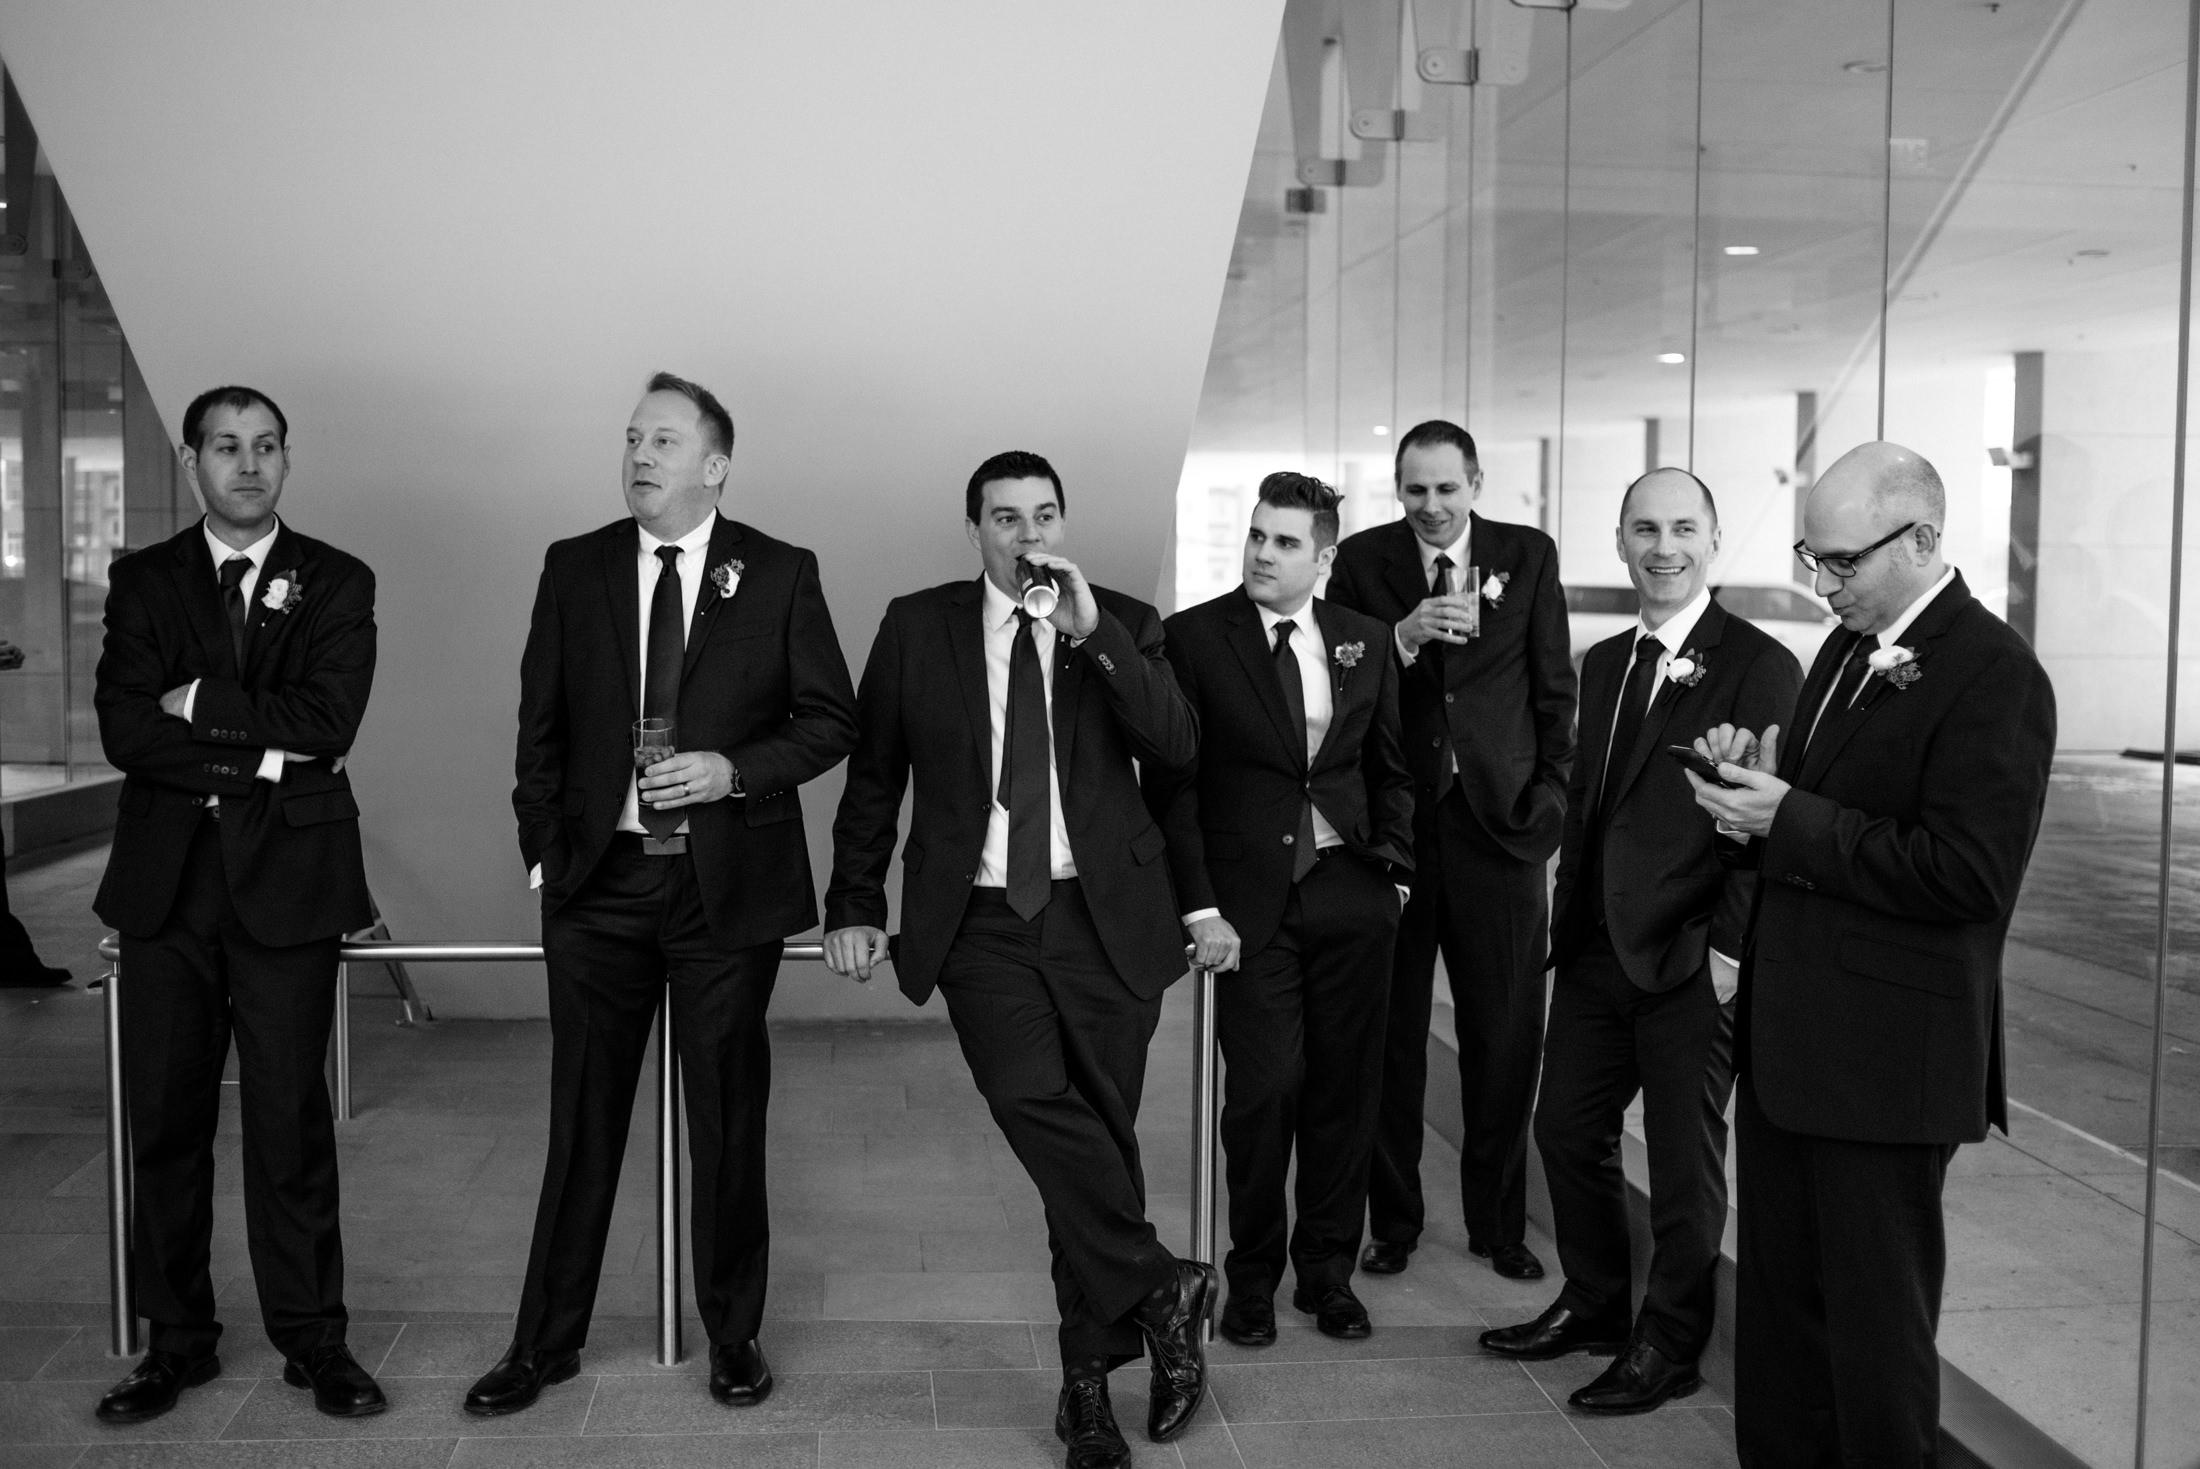 holland-center-reception-omaha-wedding-photographer-0002.JPG